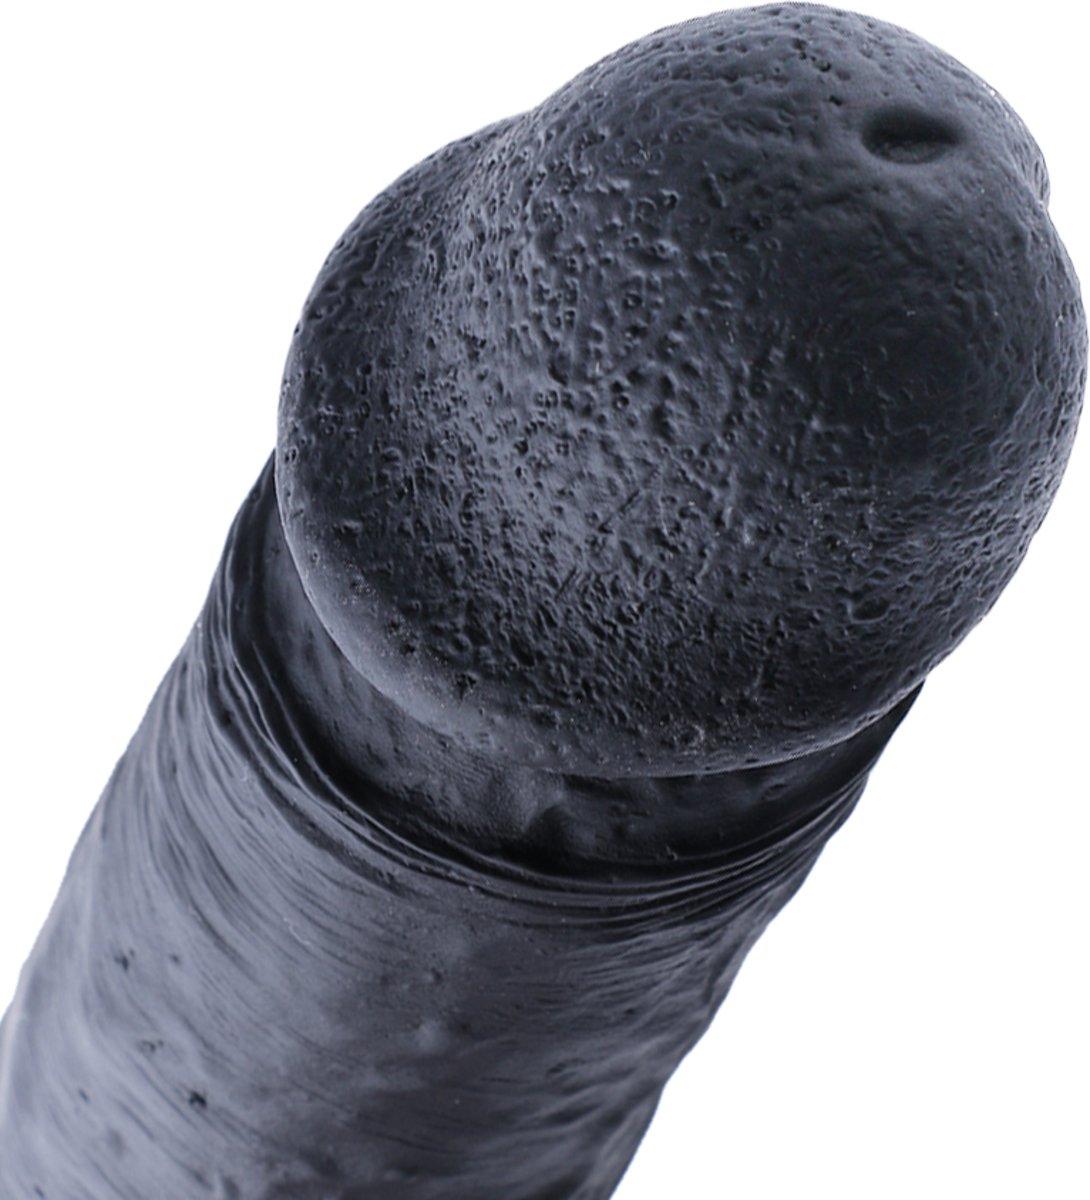 grote Blackcock Ebony Girls gratis porno